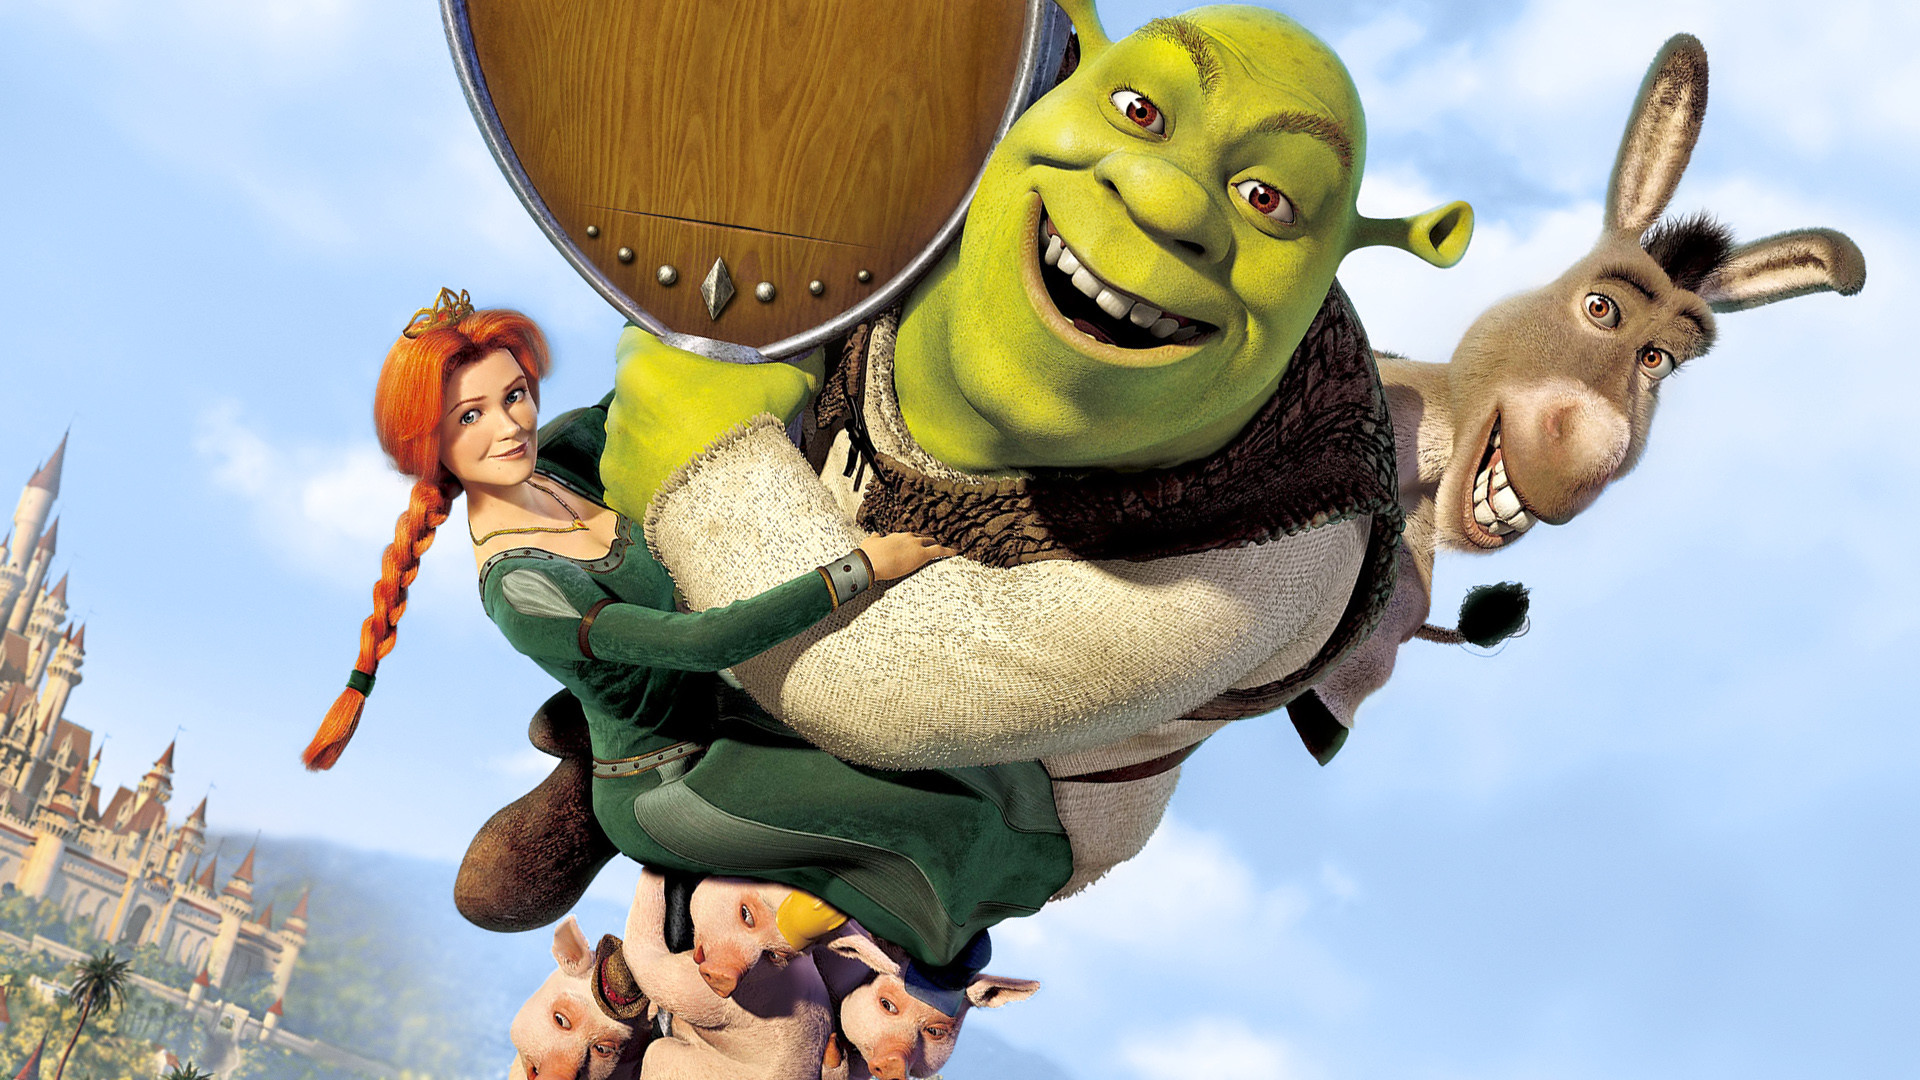 Fiona Wallpapers Shrek 2 (69+ images)